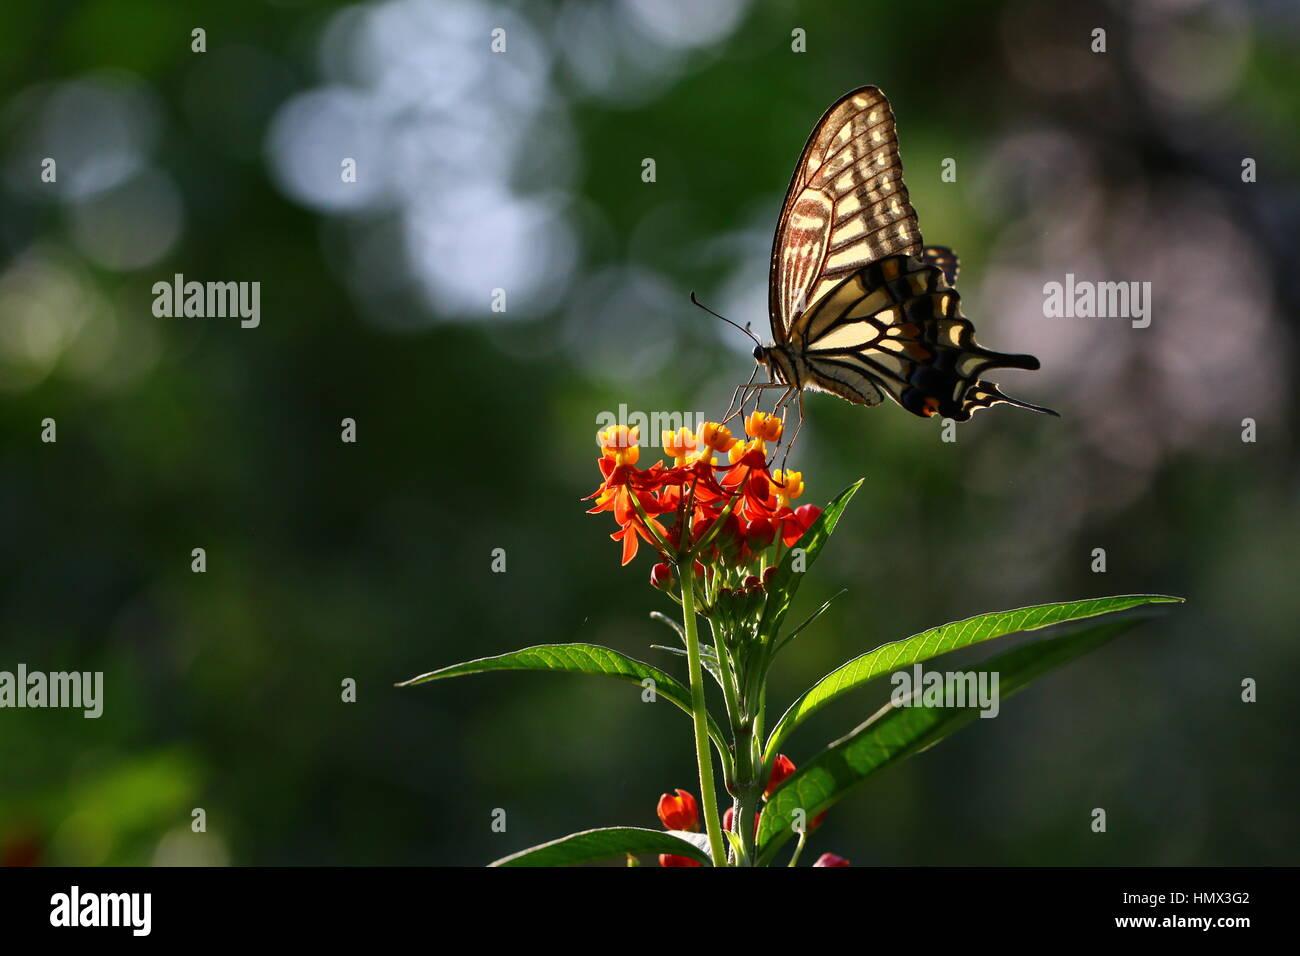 Butterfly (Papilio Xuthus) establece en flor bebiendo néctar Foto de stock